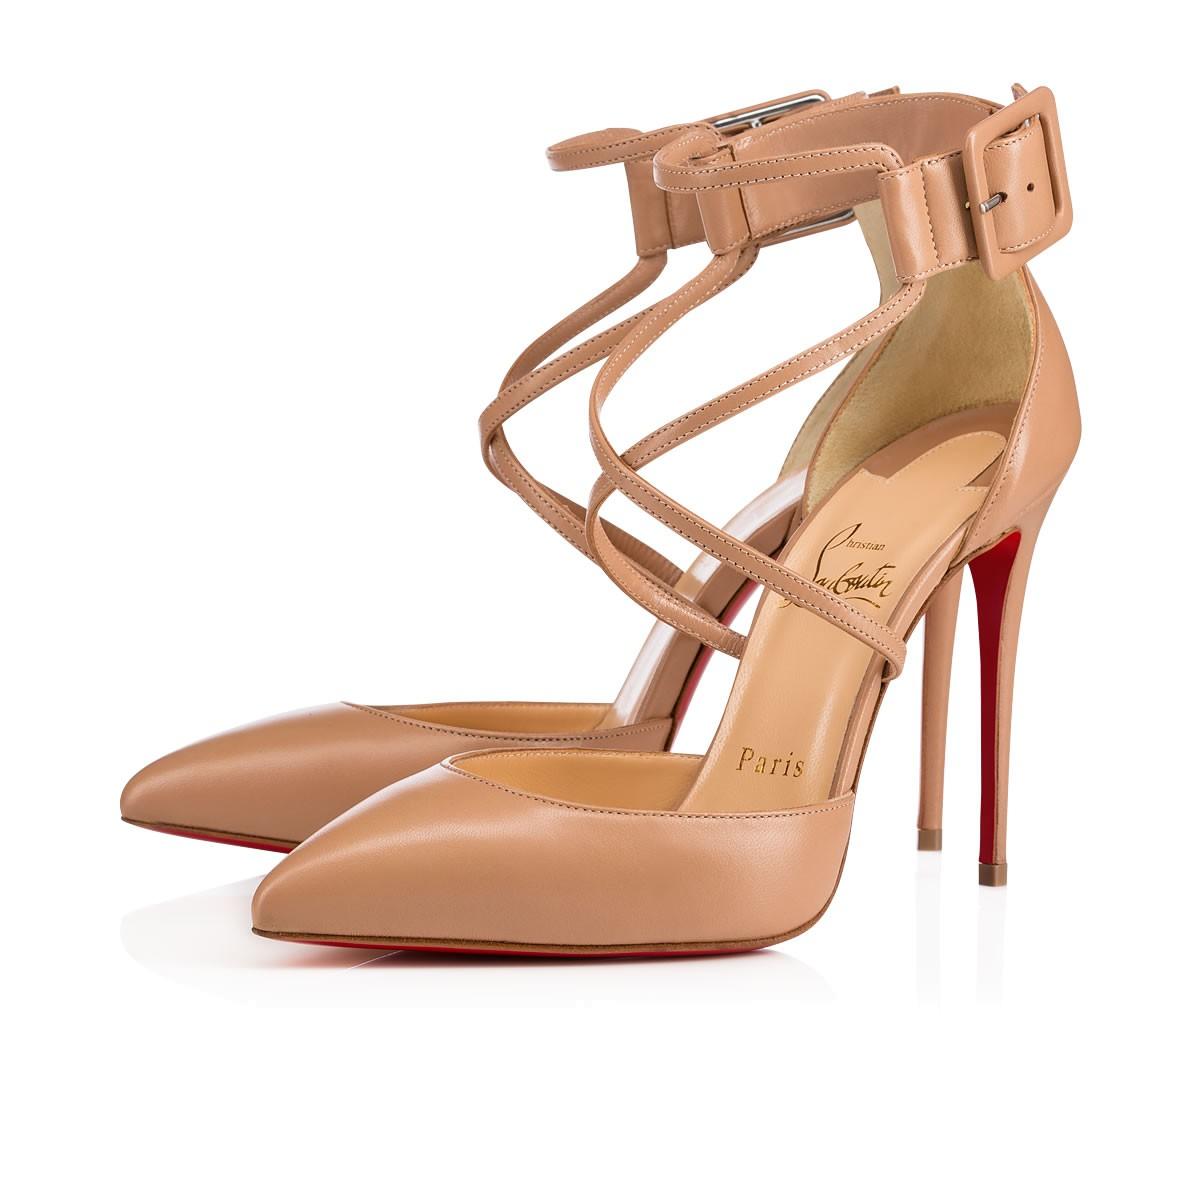 005616bd650e Suzanna 100 NUDE Nappa - Women Shoes - Christian Louboutin